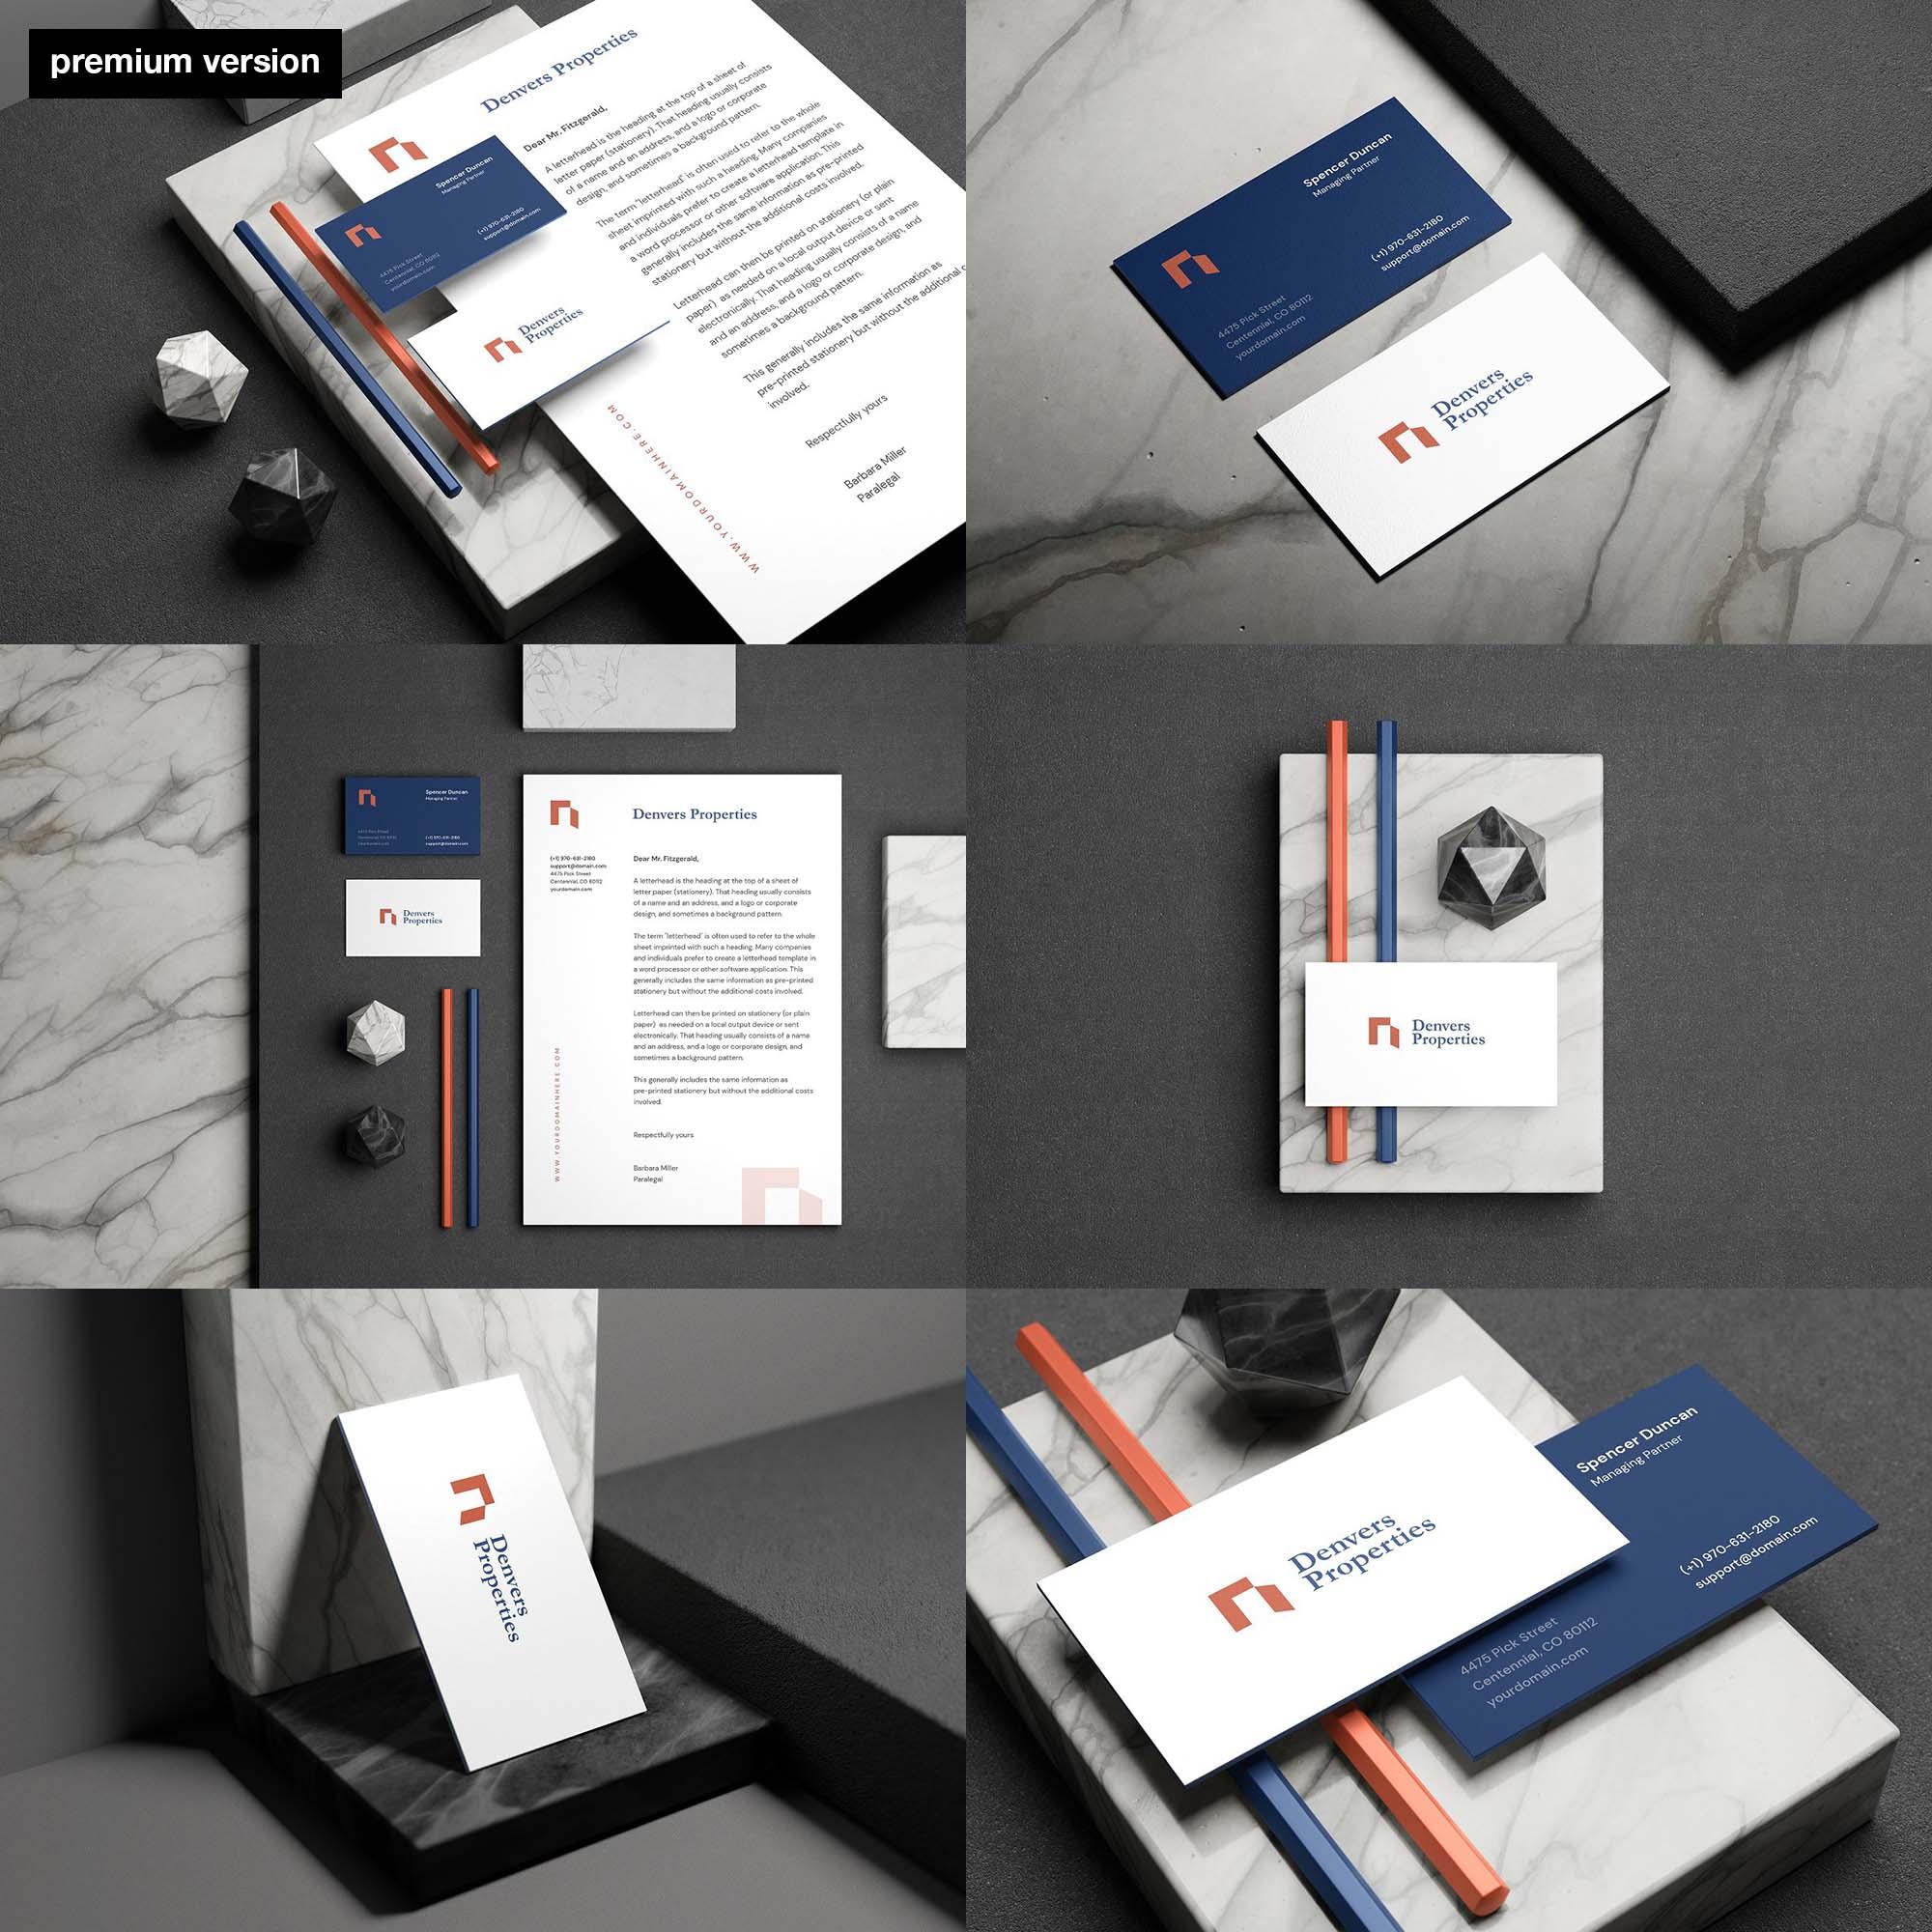 Minimal Stationery Mockup - Premium Version